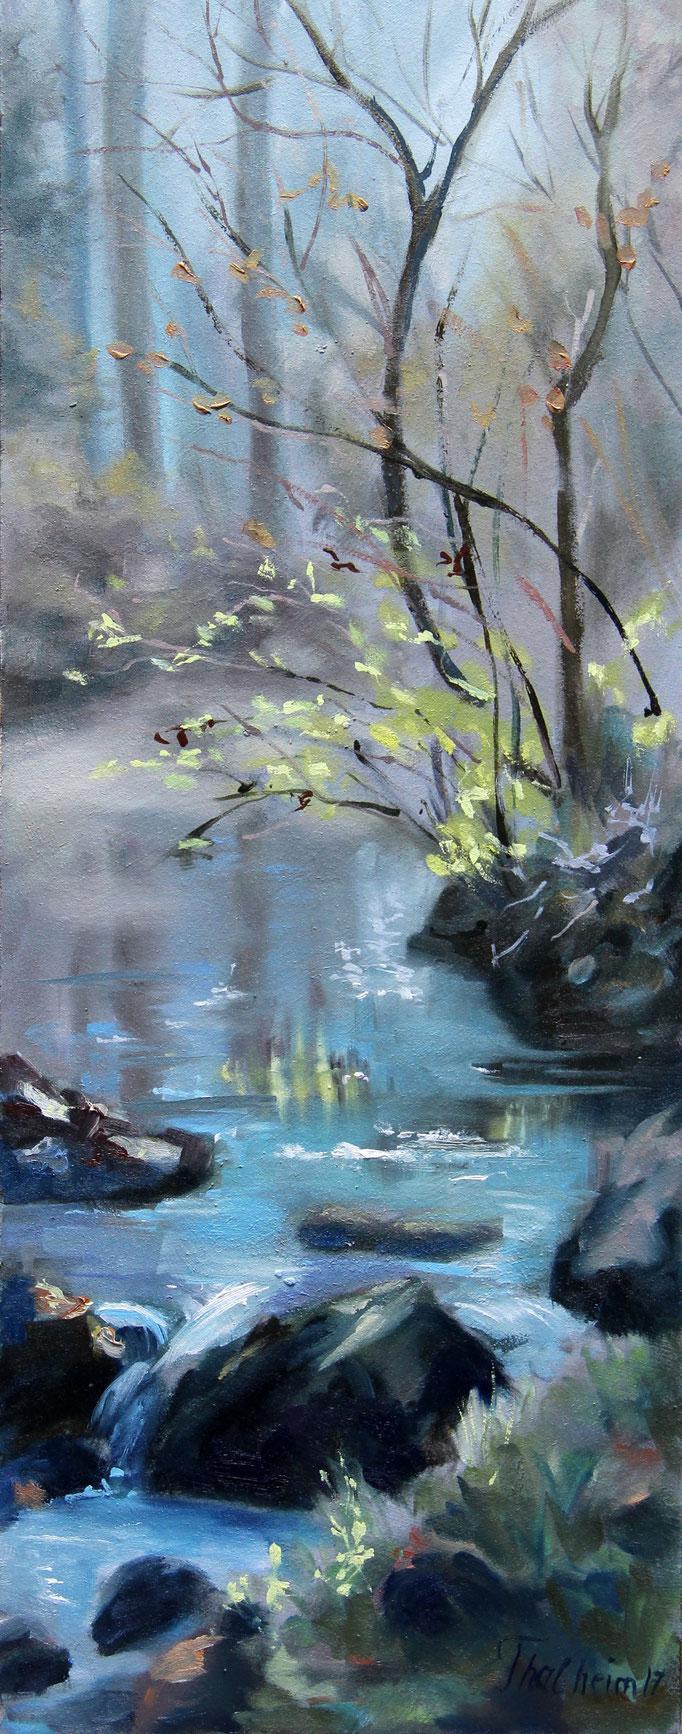 Titel:  Sonne über dem Fluß       Größe:  50/20 cm       Entstehung:  Januar 2017       Medium: Öl auf Holz, im Schattenfugenrahmen